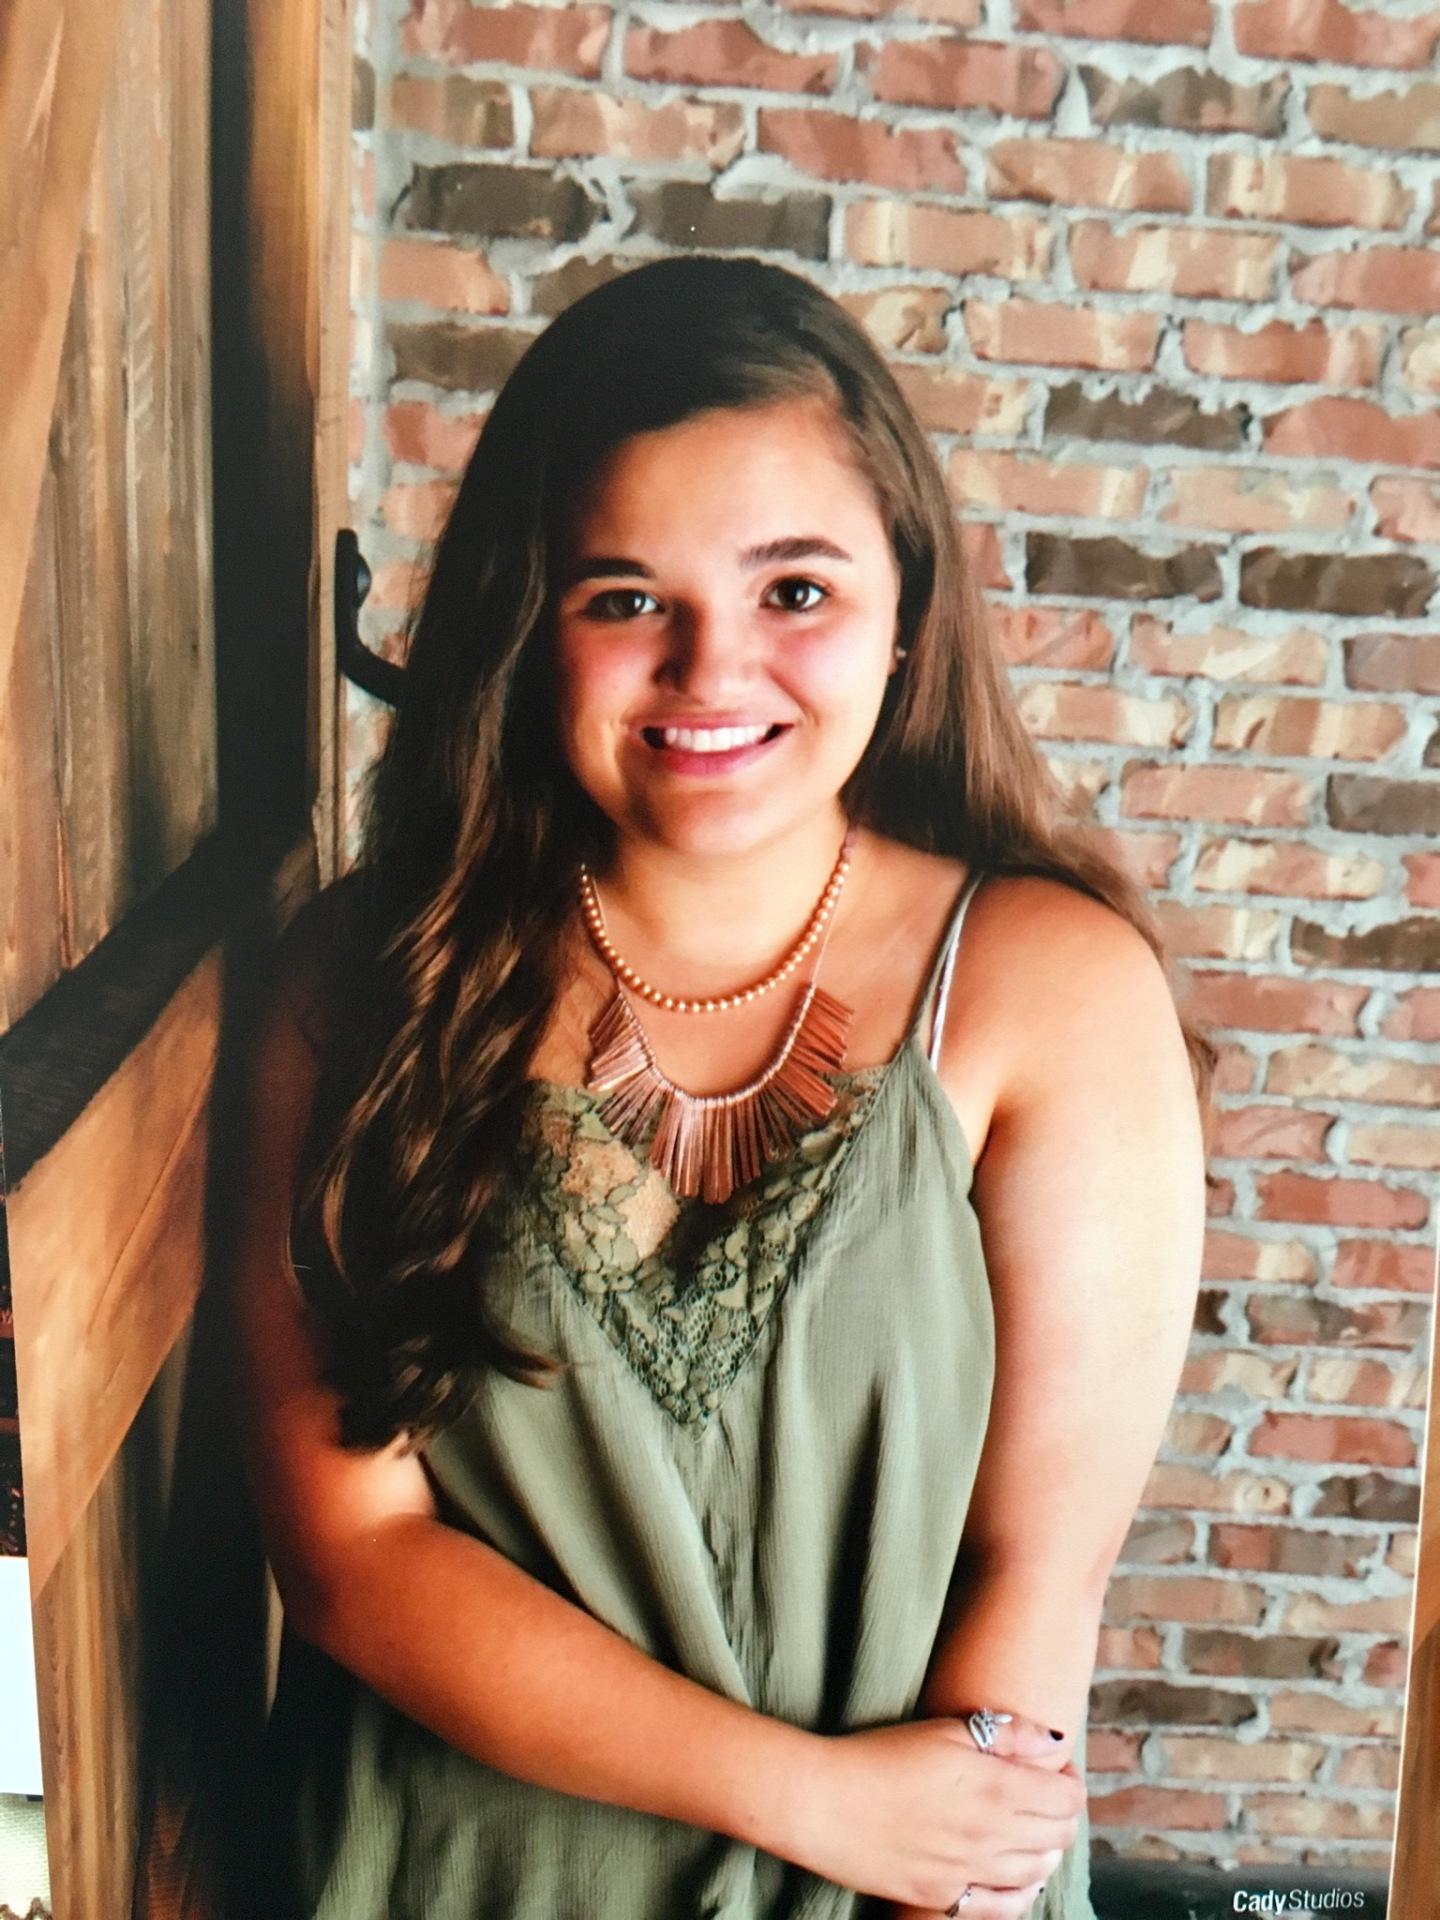 Kayley Ulmer, 12